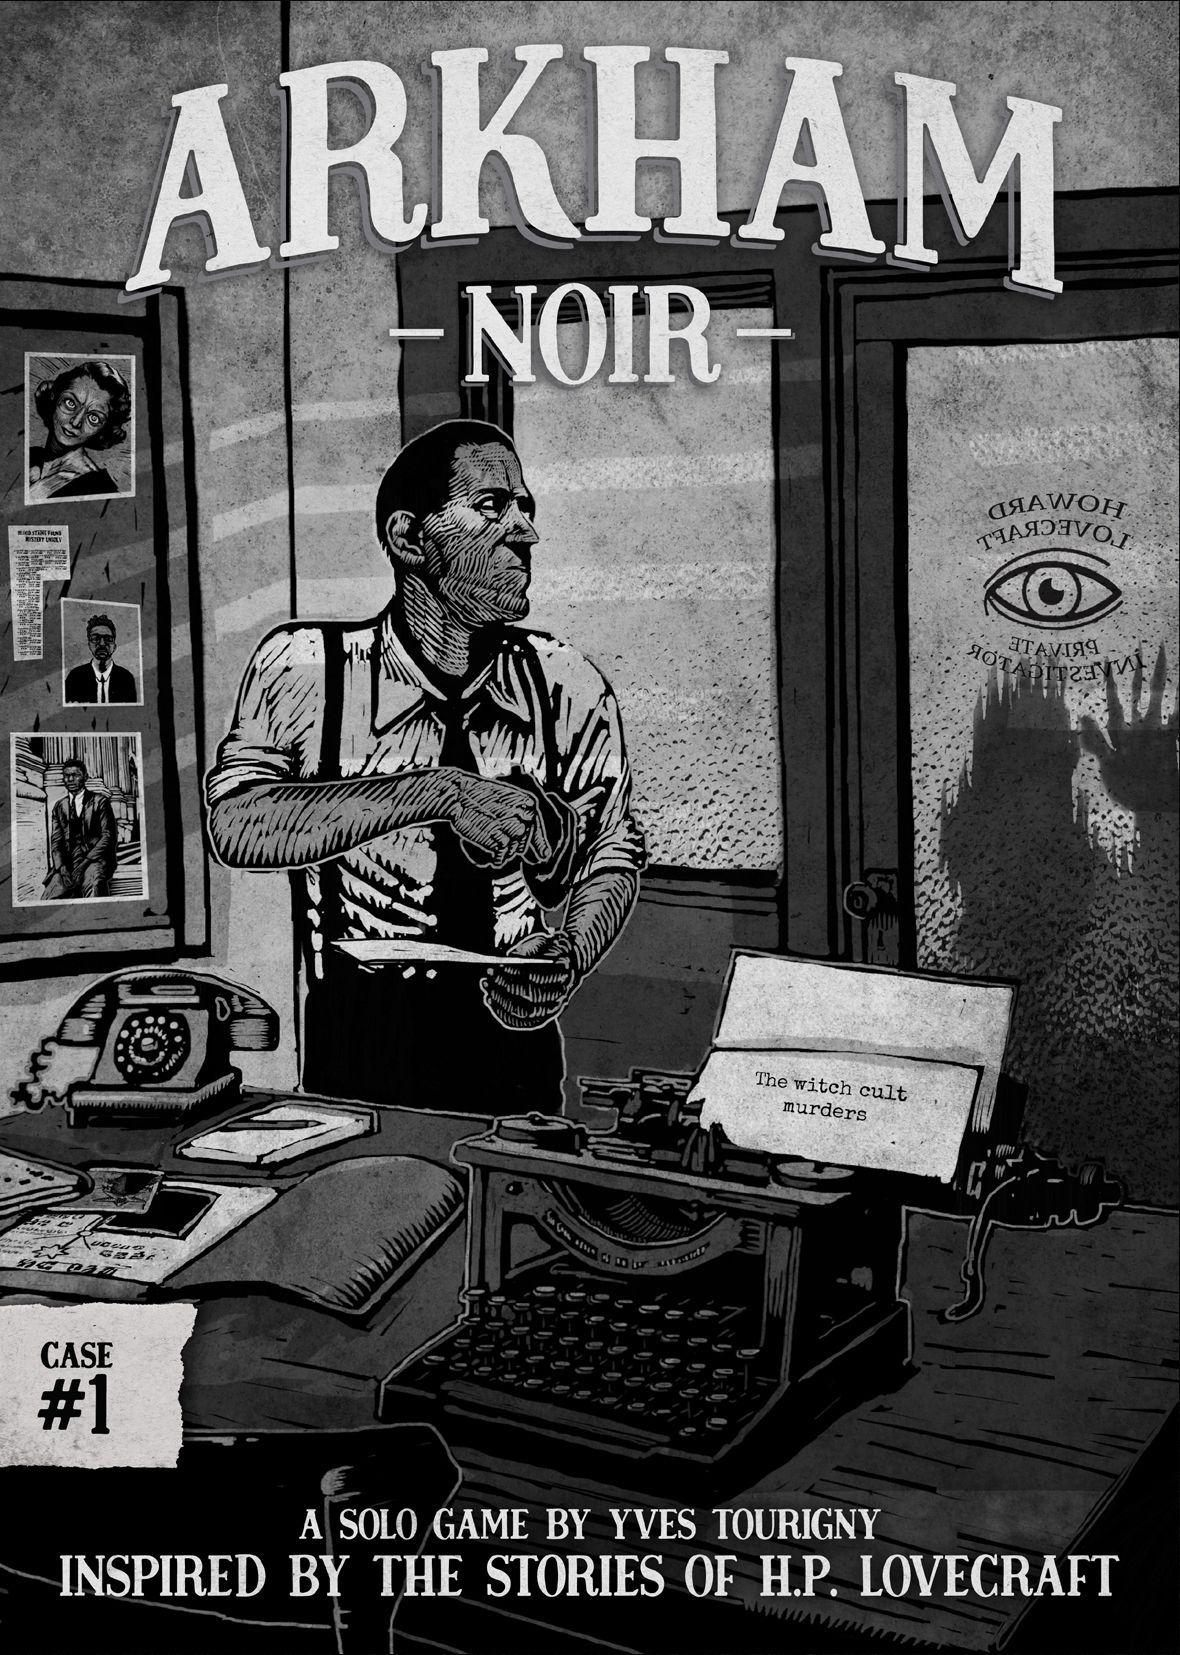 Arkham Noir Cover - asmodee